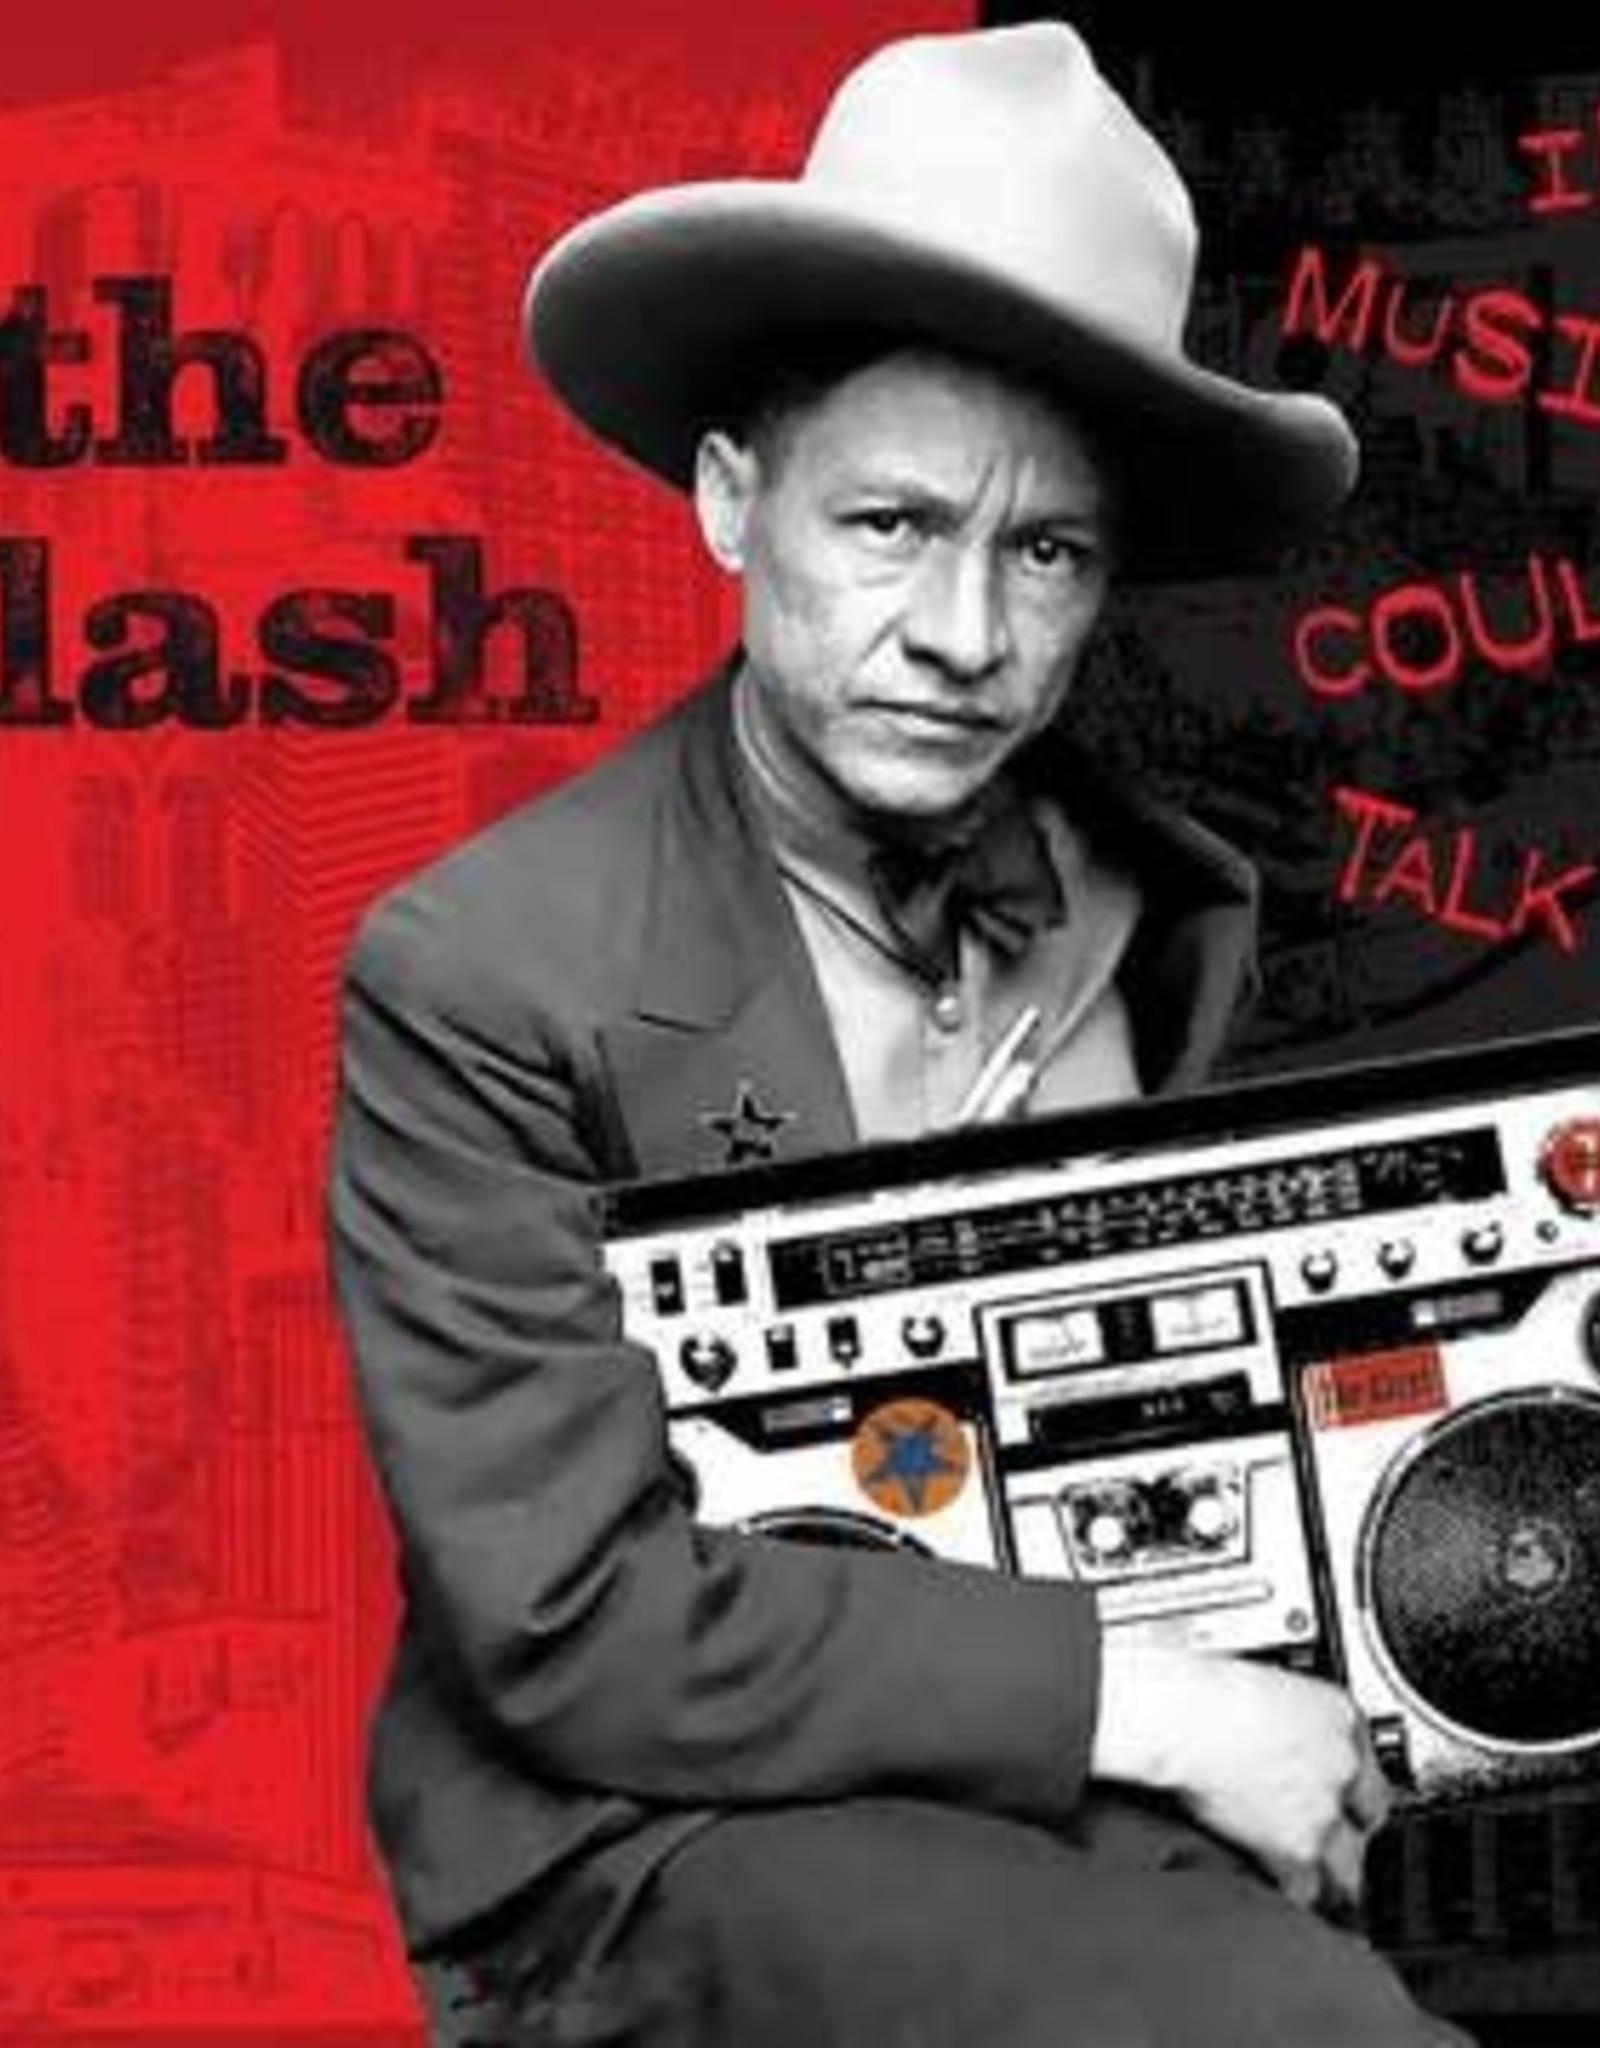 The Clash - If Music Could Talk (2 Lp) (180G Vinyl)(RSD 7/21)